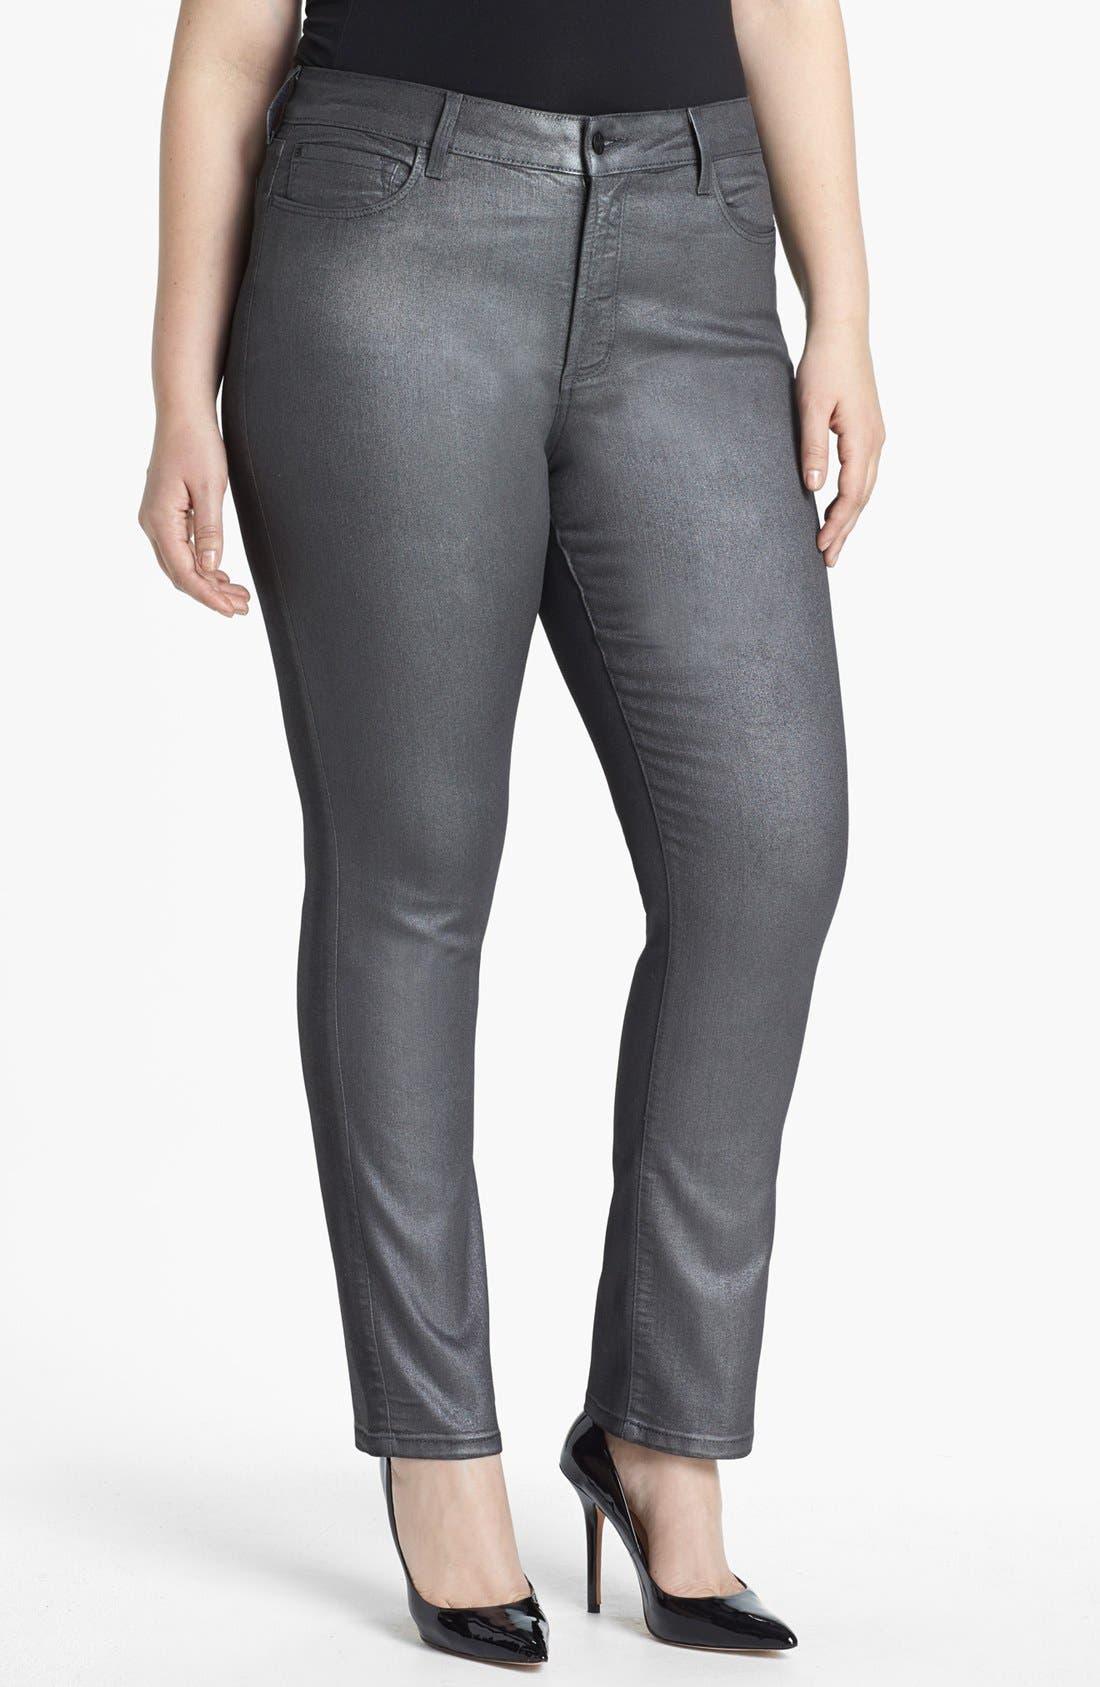 Main Image - NYDJ 'Sheri' Foiled Stretch Skinny Jeans (Plus Size)